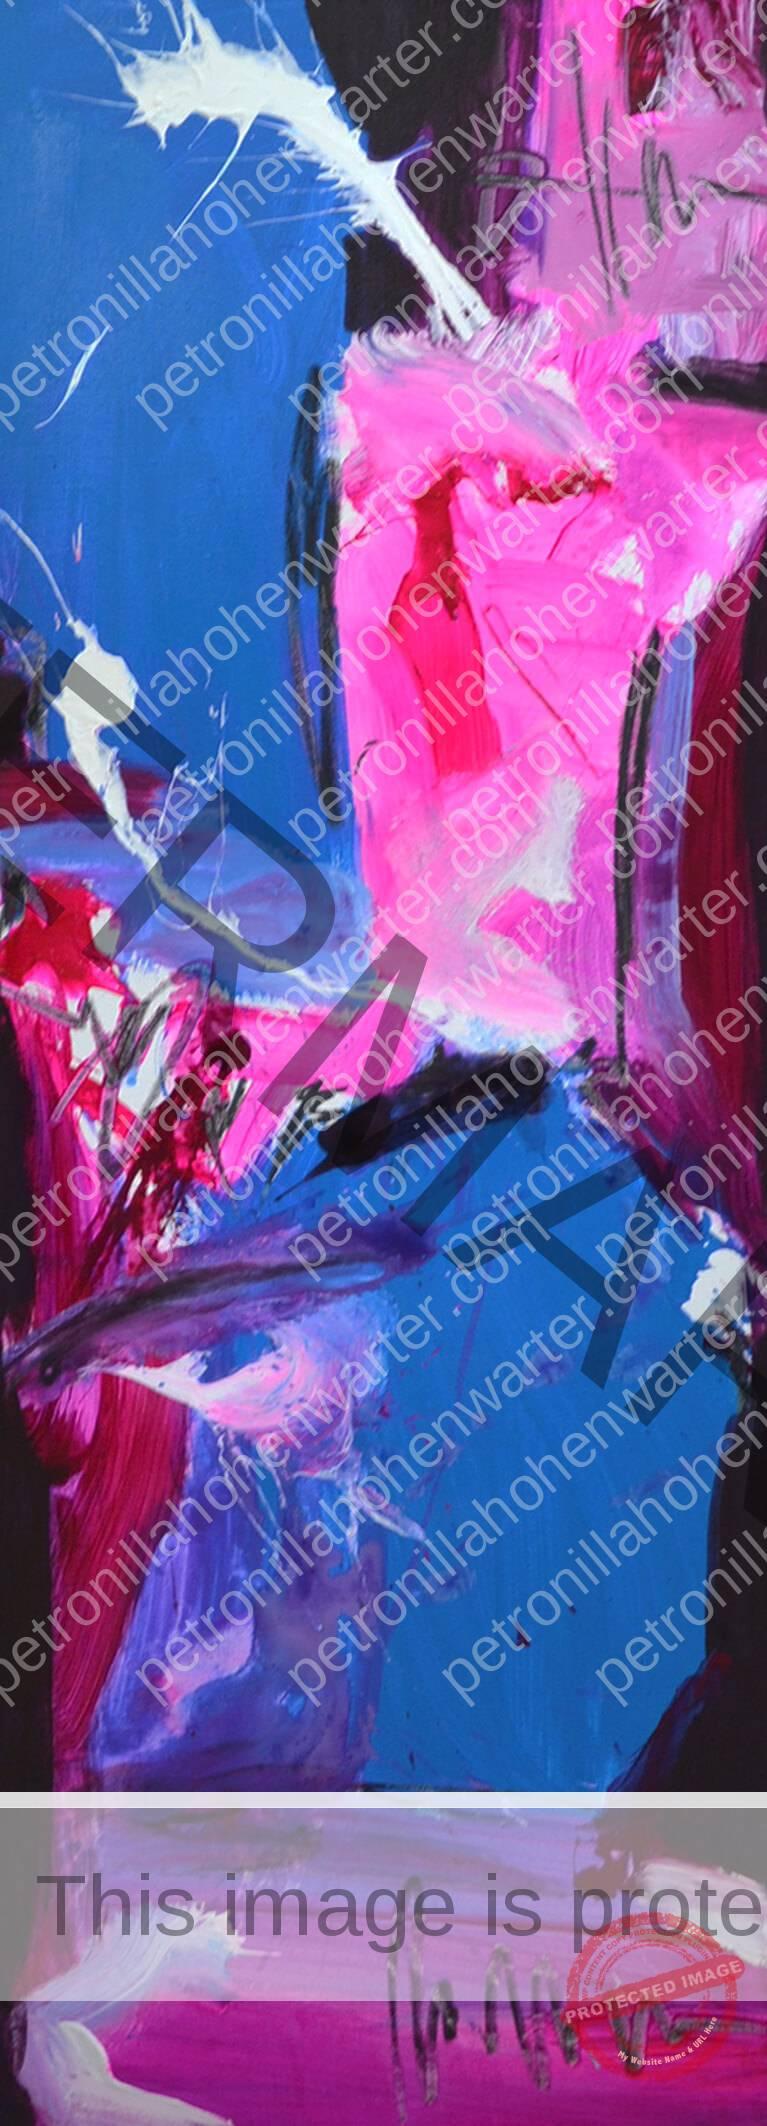 pink blue abstract artwork empowerment